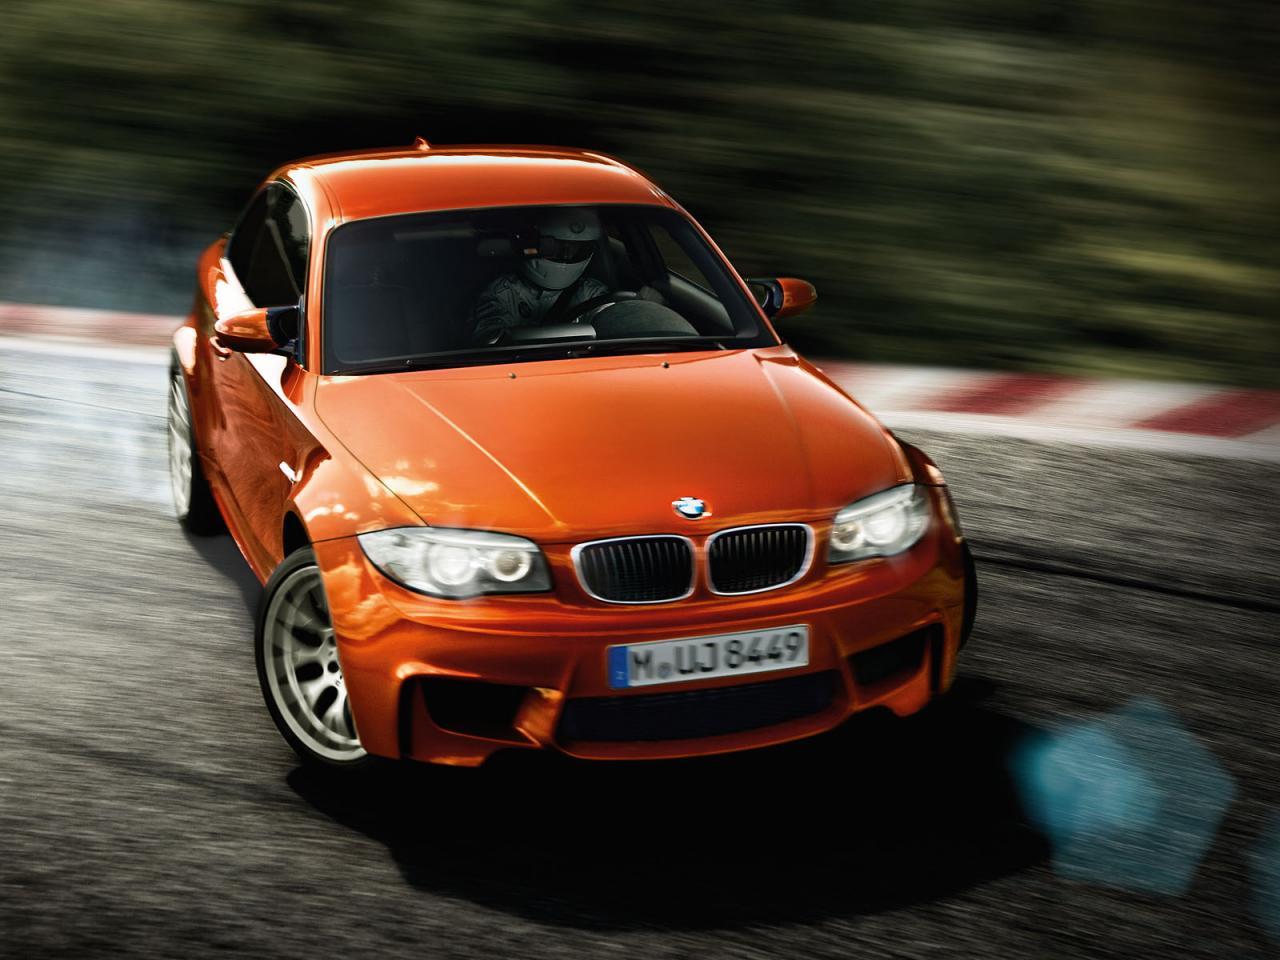 Photo of Αεροκουρτίνες… για την BMW 1 M!